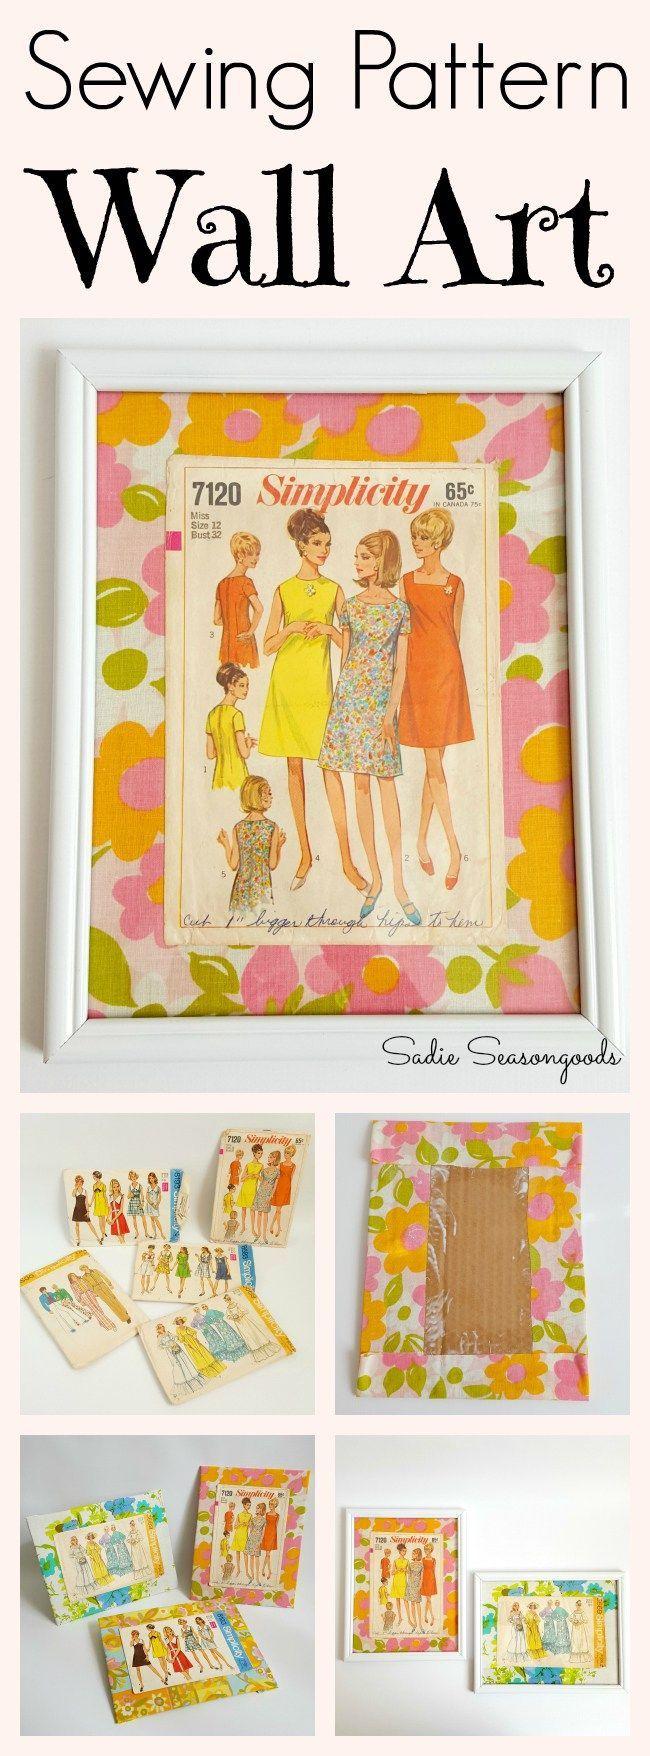 Fashion Wall Art using Repurposed Vintage Sewing Patterns | Craft ...